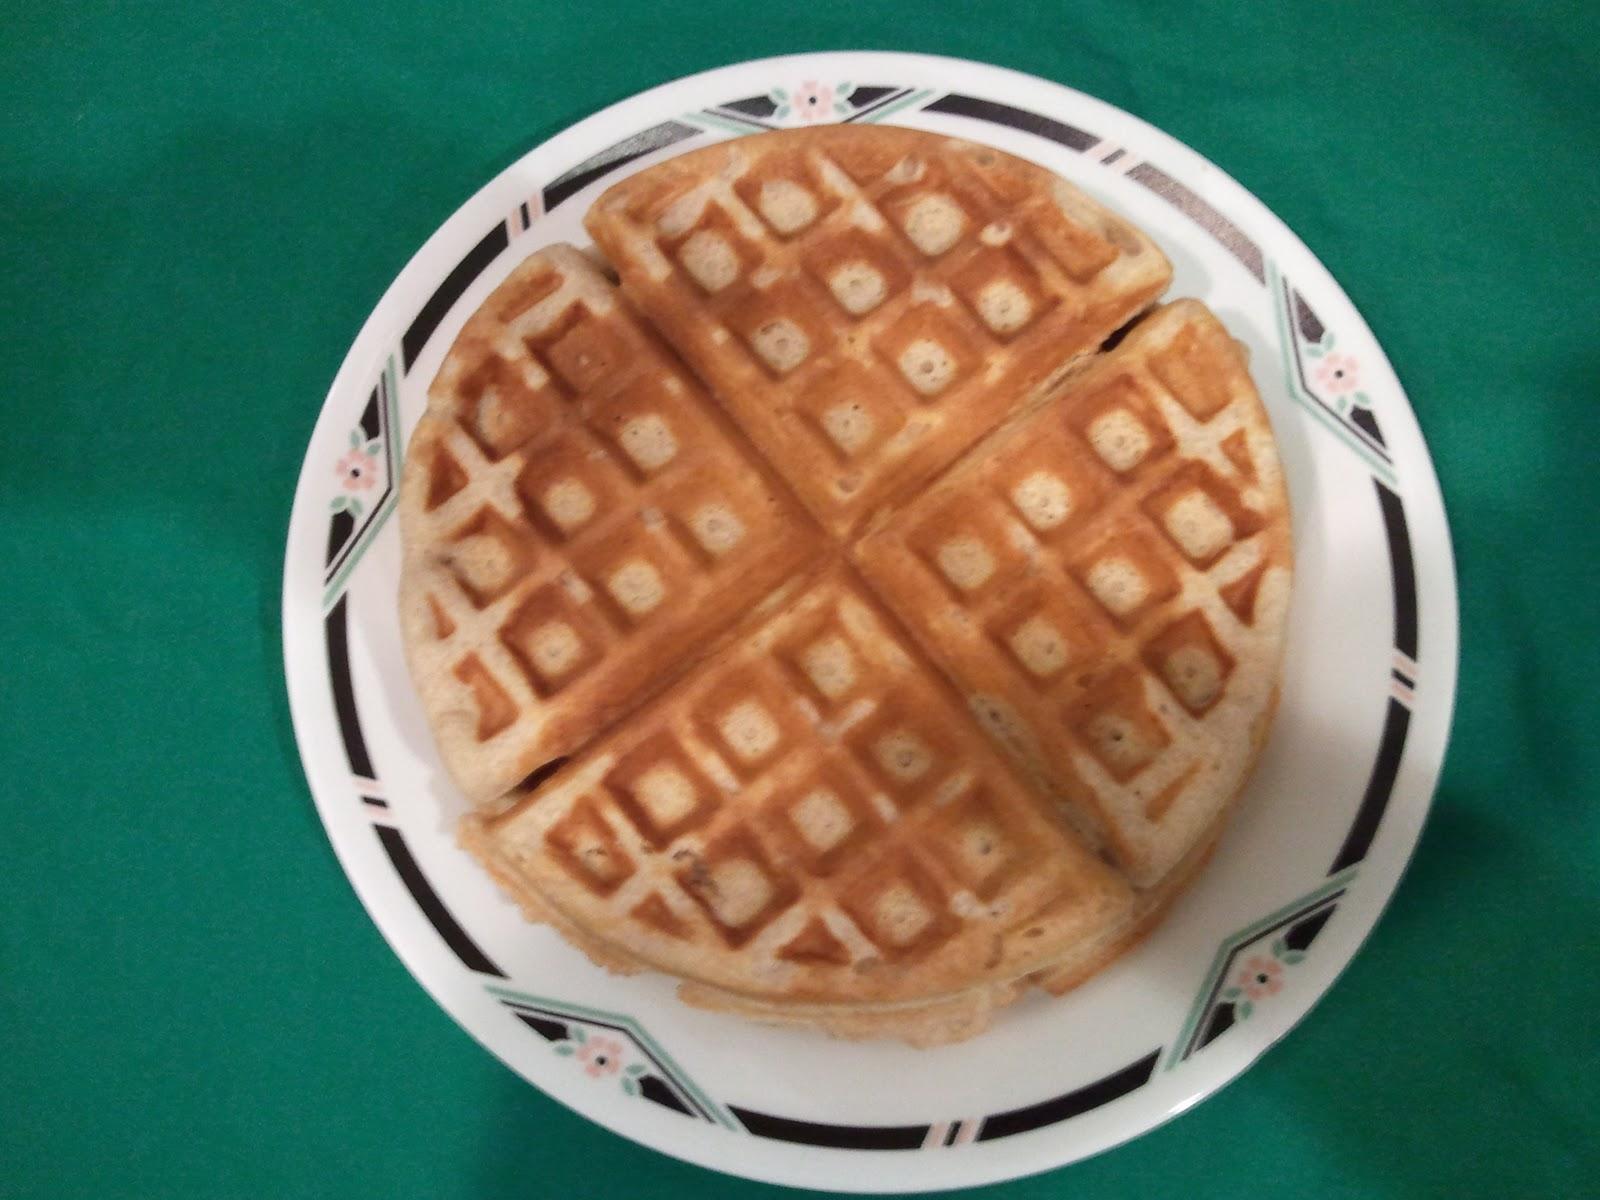 Whole Grain Waffles (Frugal Food Thursday) | Frugal Follies